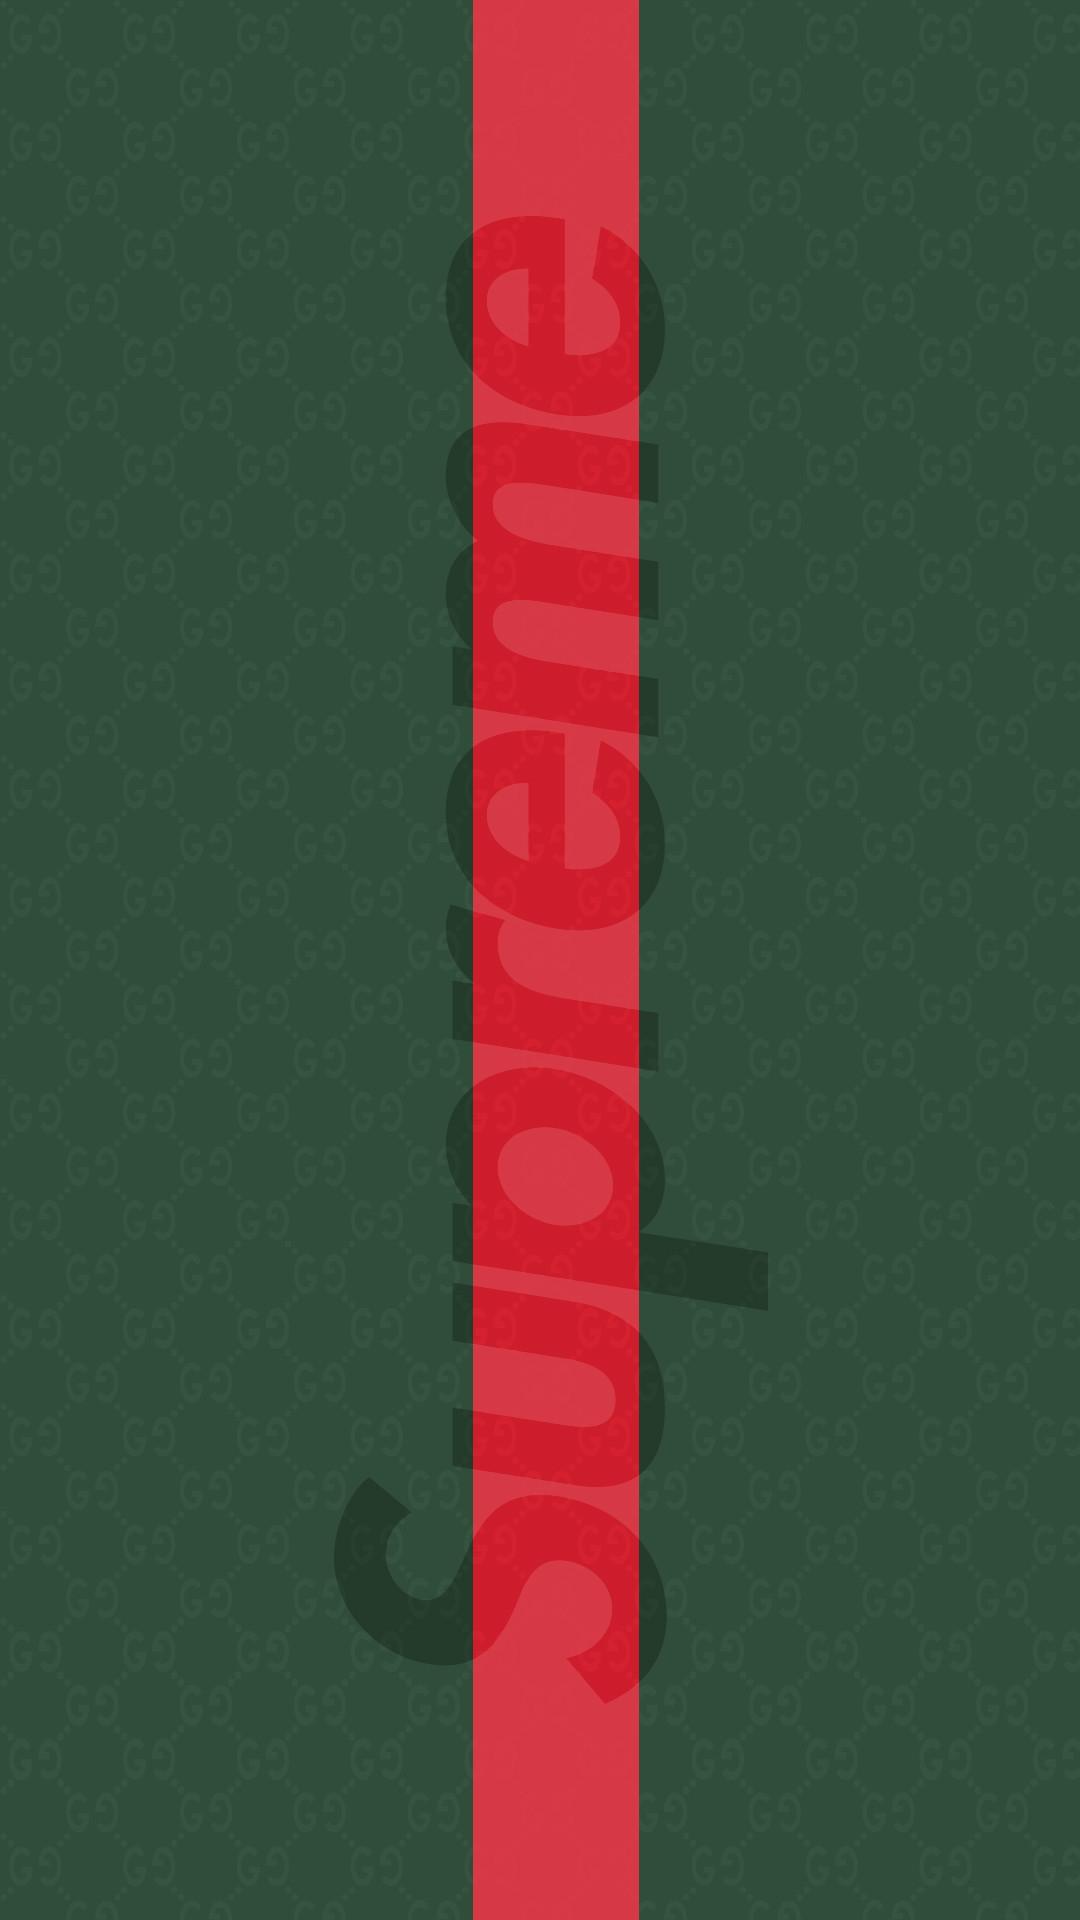 gucci. Supreme Iphone WallpaperBentley …